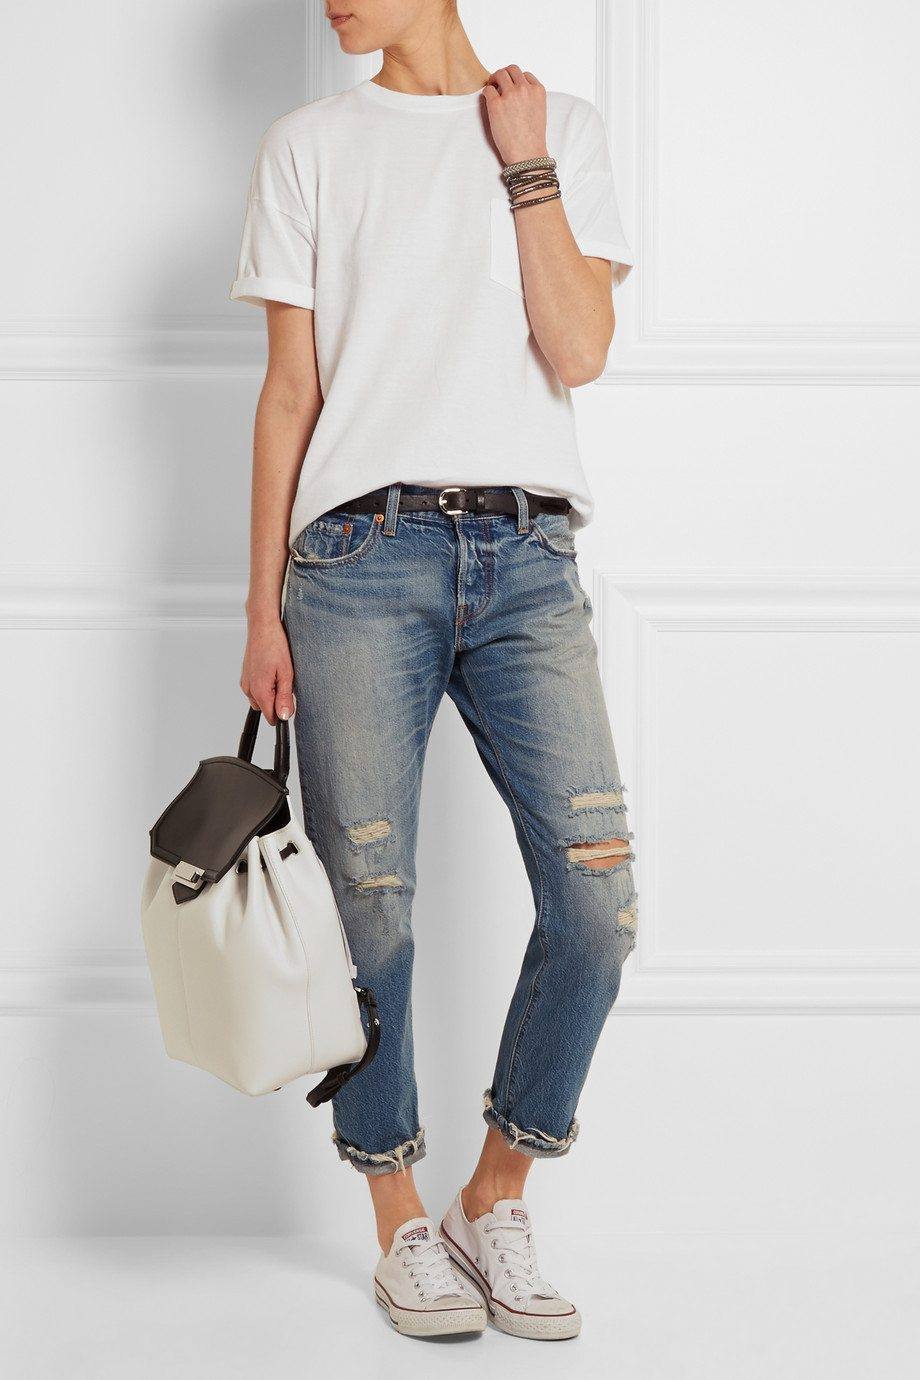 The Plain White T-shirt